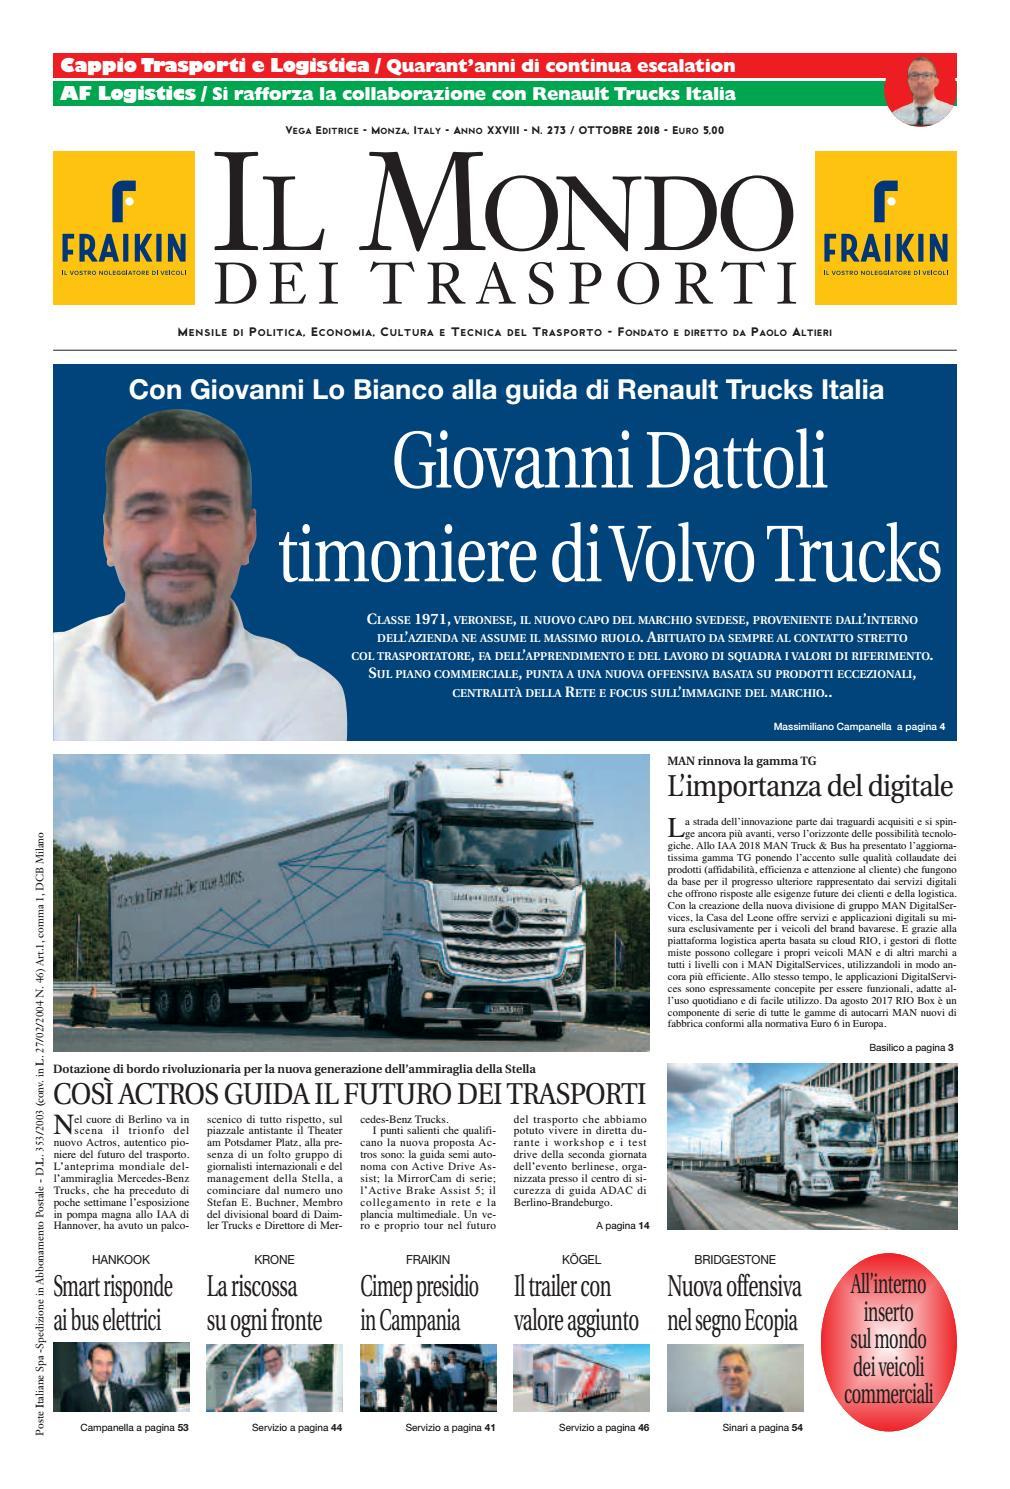 Il Mondo dei Trasporti - Ottobre 2018 by Vega Editrice - issuu a4f7782b387